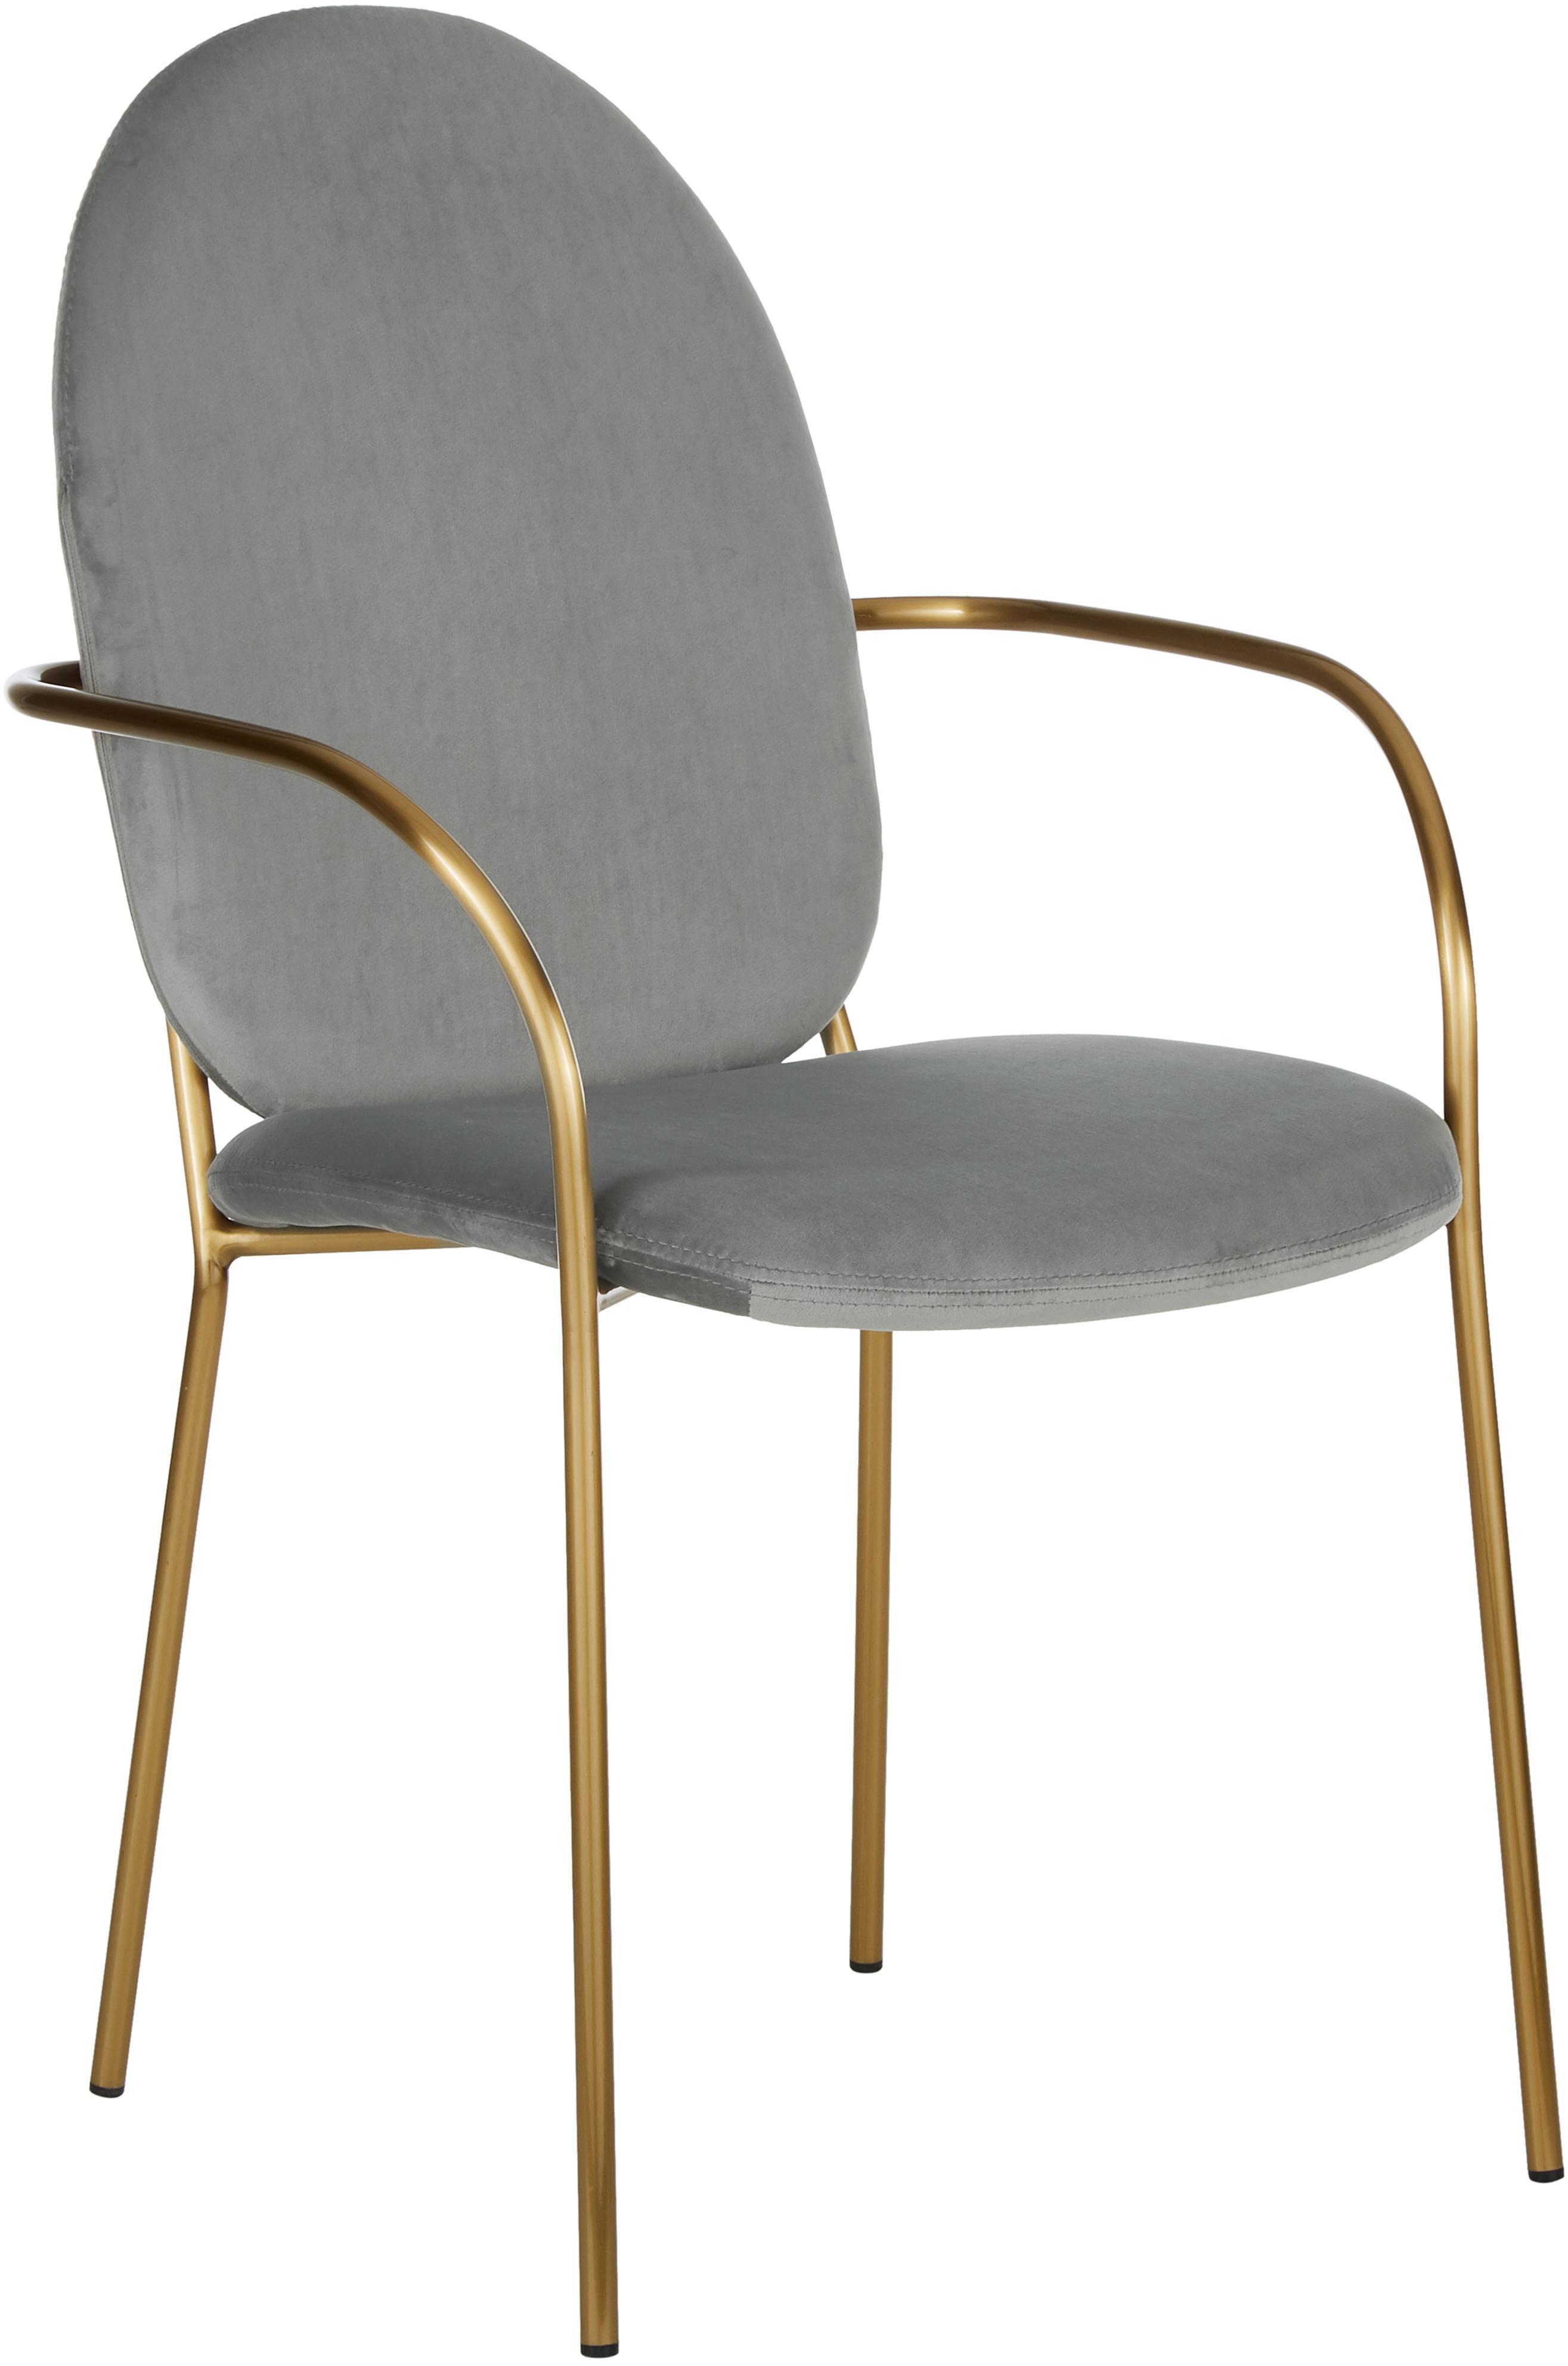 Samt-Armlehnstuhl Mary, Bezug: Samt (Polyester) 15.000 S, Gestell: Metall, beschichtet, Samt Grau, Beine Gold, B 55 x T 64 cm